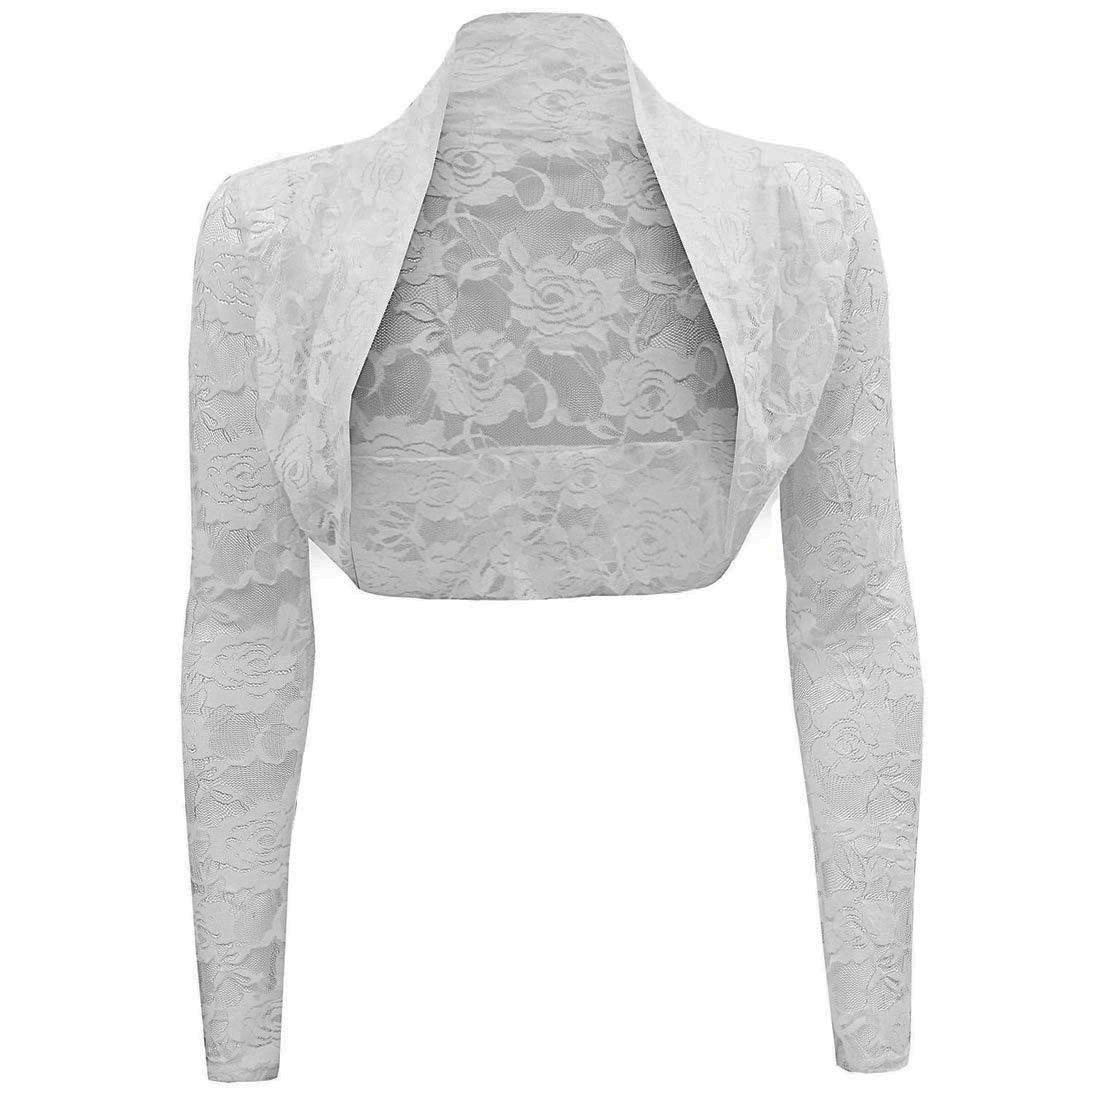 Womens Sheer Lace Long Sleeve Bolero Shrug Crop Top Summer Party ...